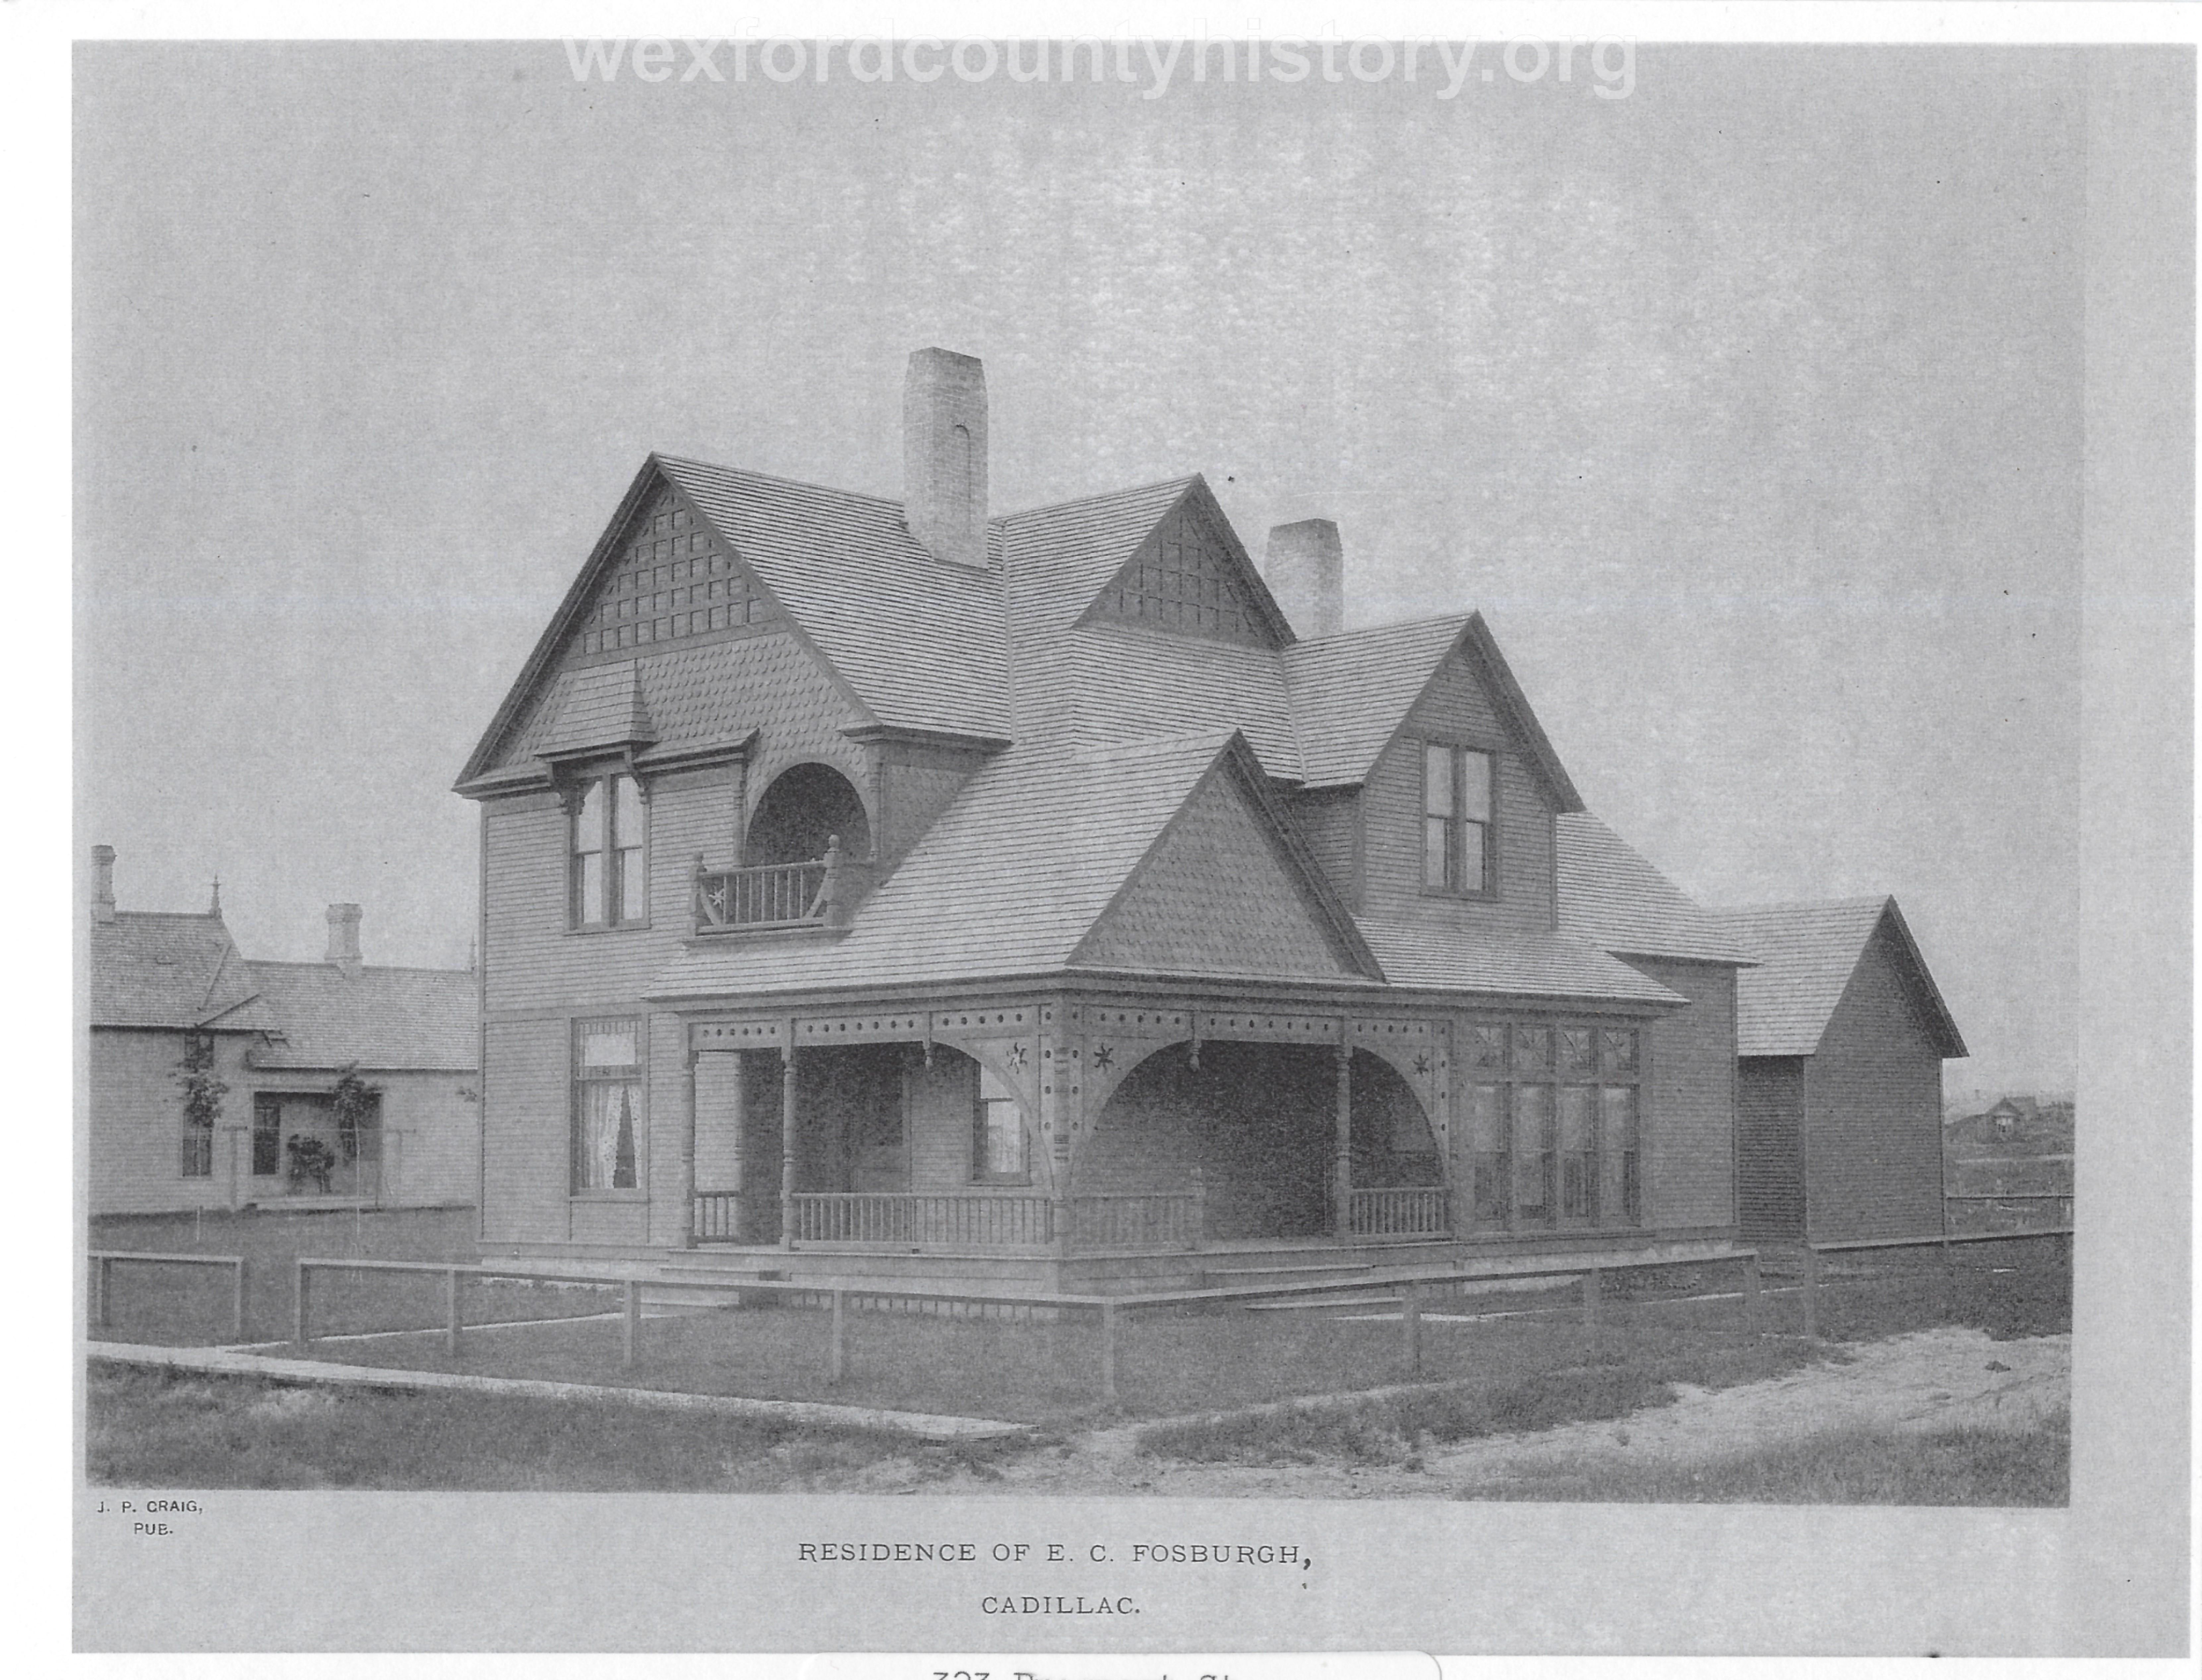 E. C. Fosburgh House